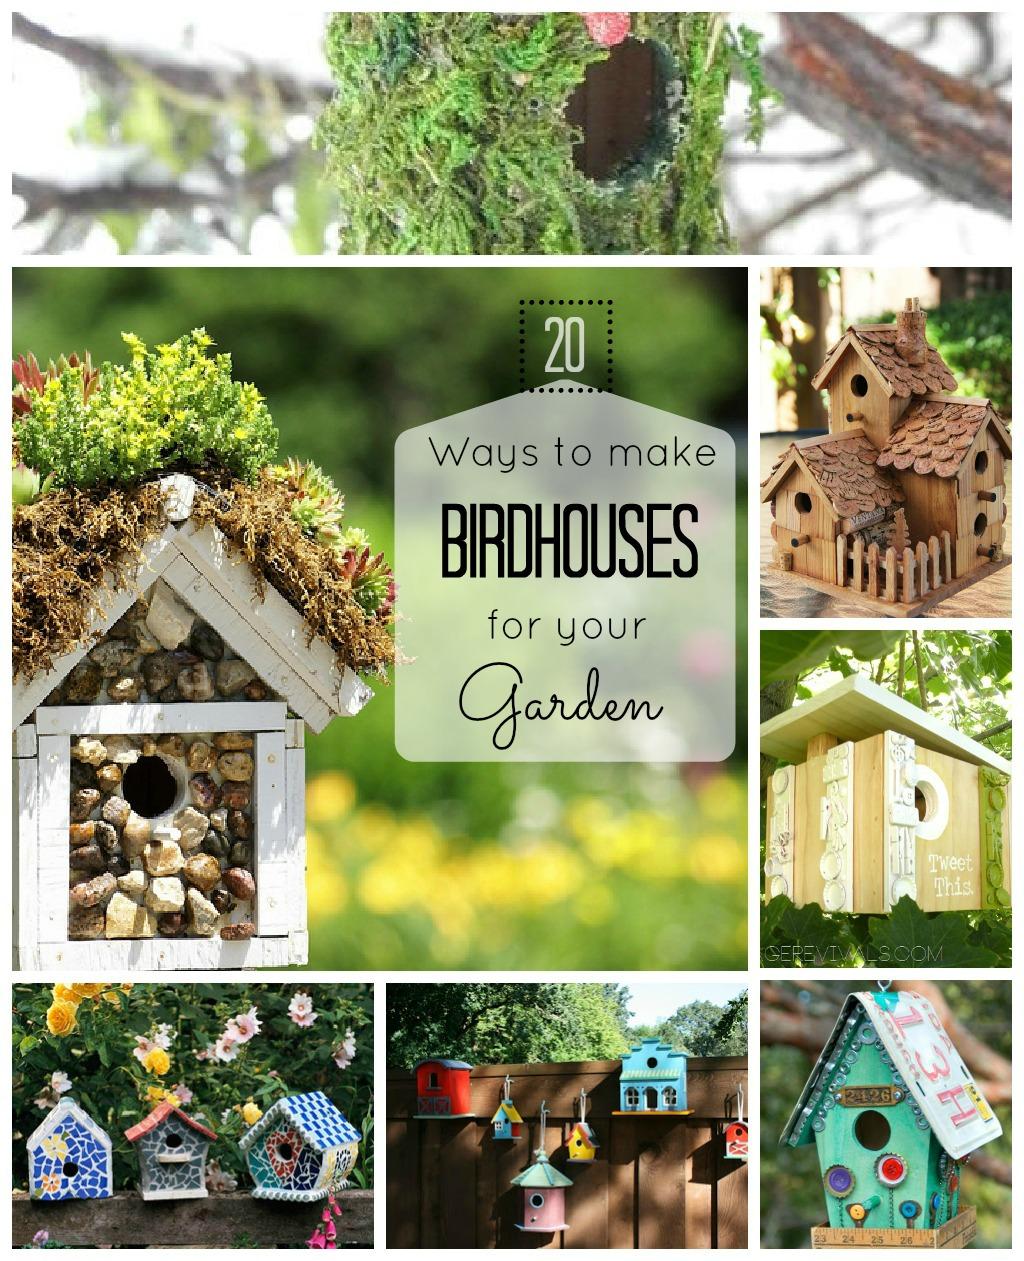 How to make a bird house - 20 Ideas To Make Birdhouses